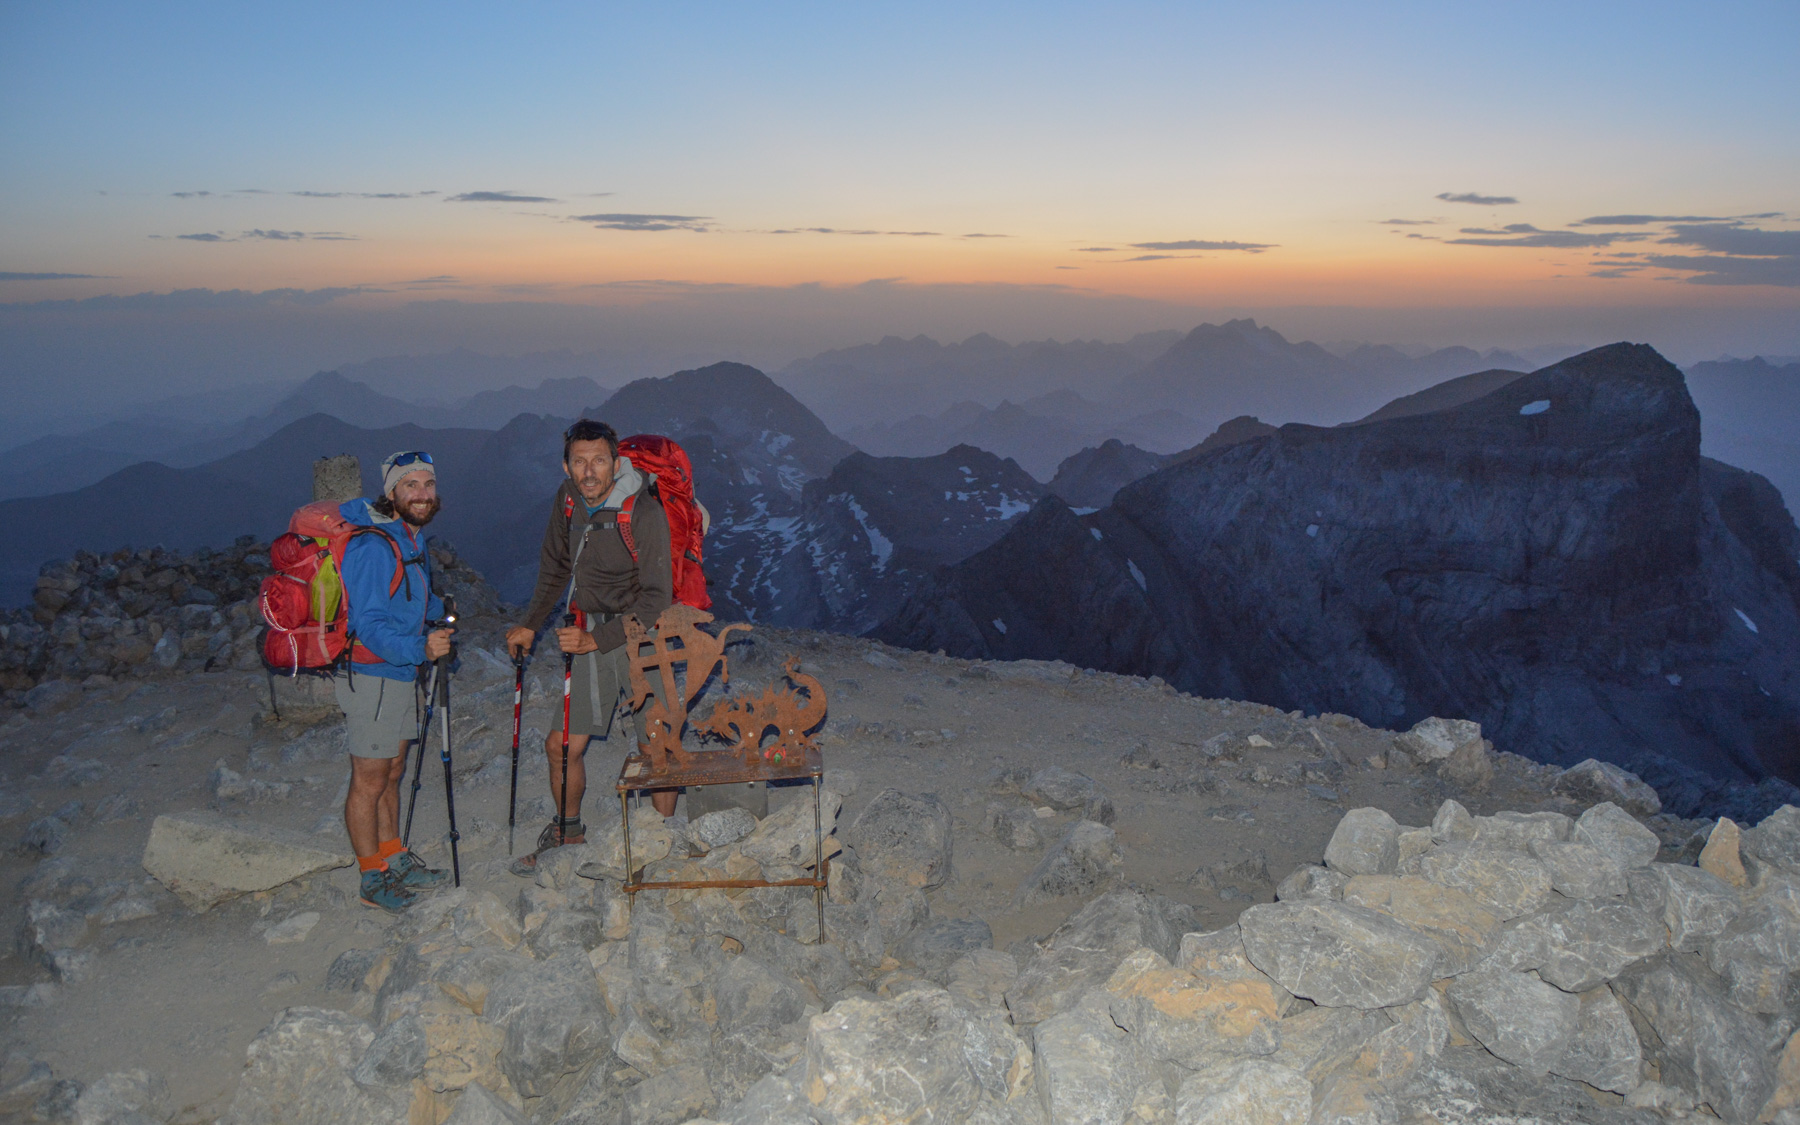 Monte Perdido et Faja de las Flores, Jour 1, Ordesa, Aragon, Espagne 51